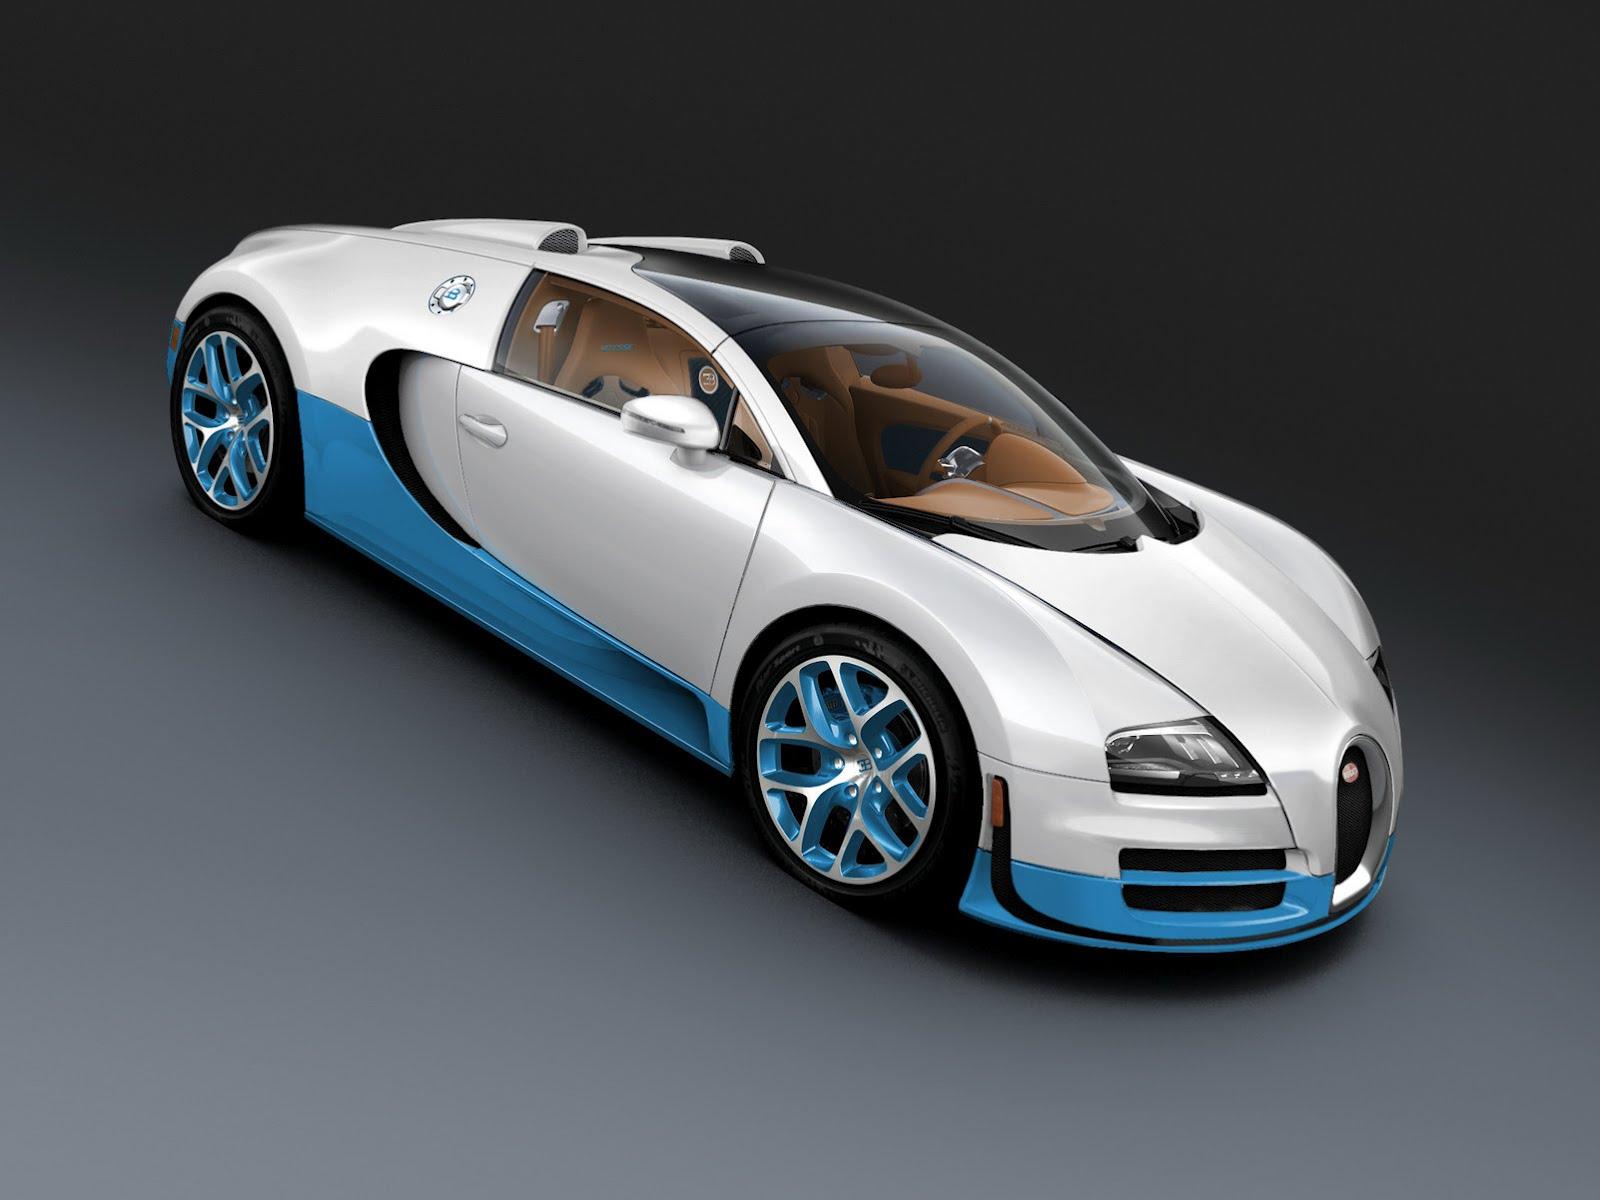 special edition bugatti veyron car news super cars autocar india. Black Bedroom Furniture Sets. Home Design Ideas